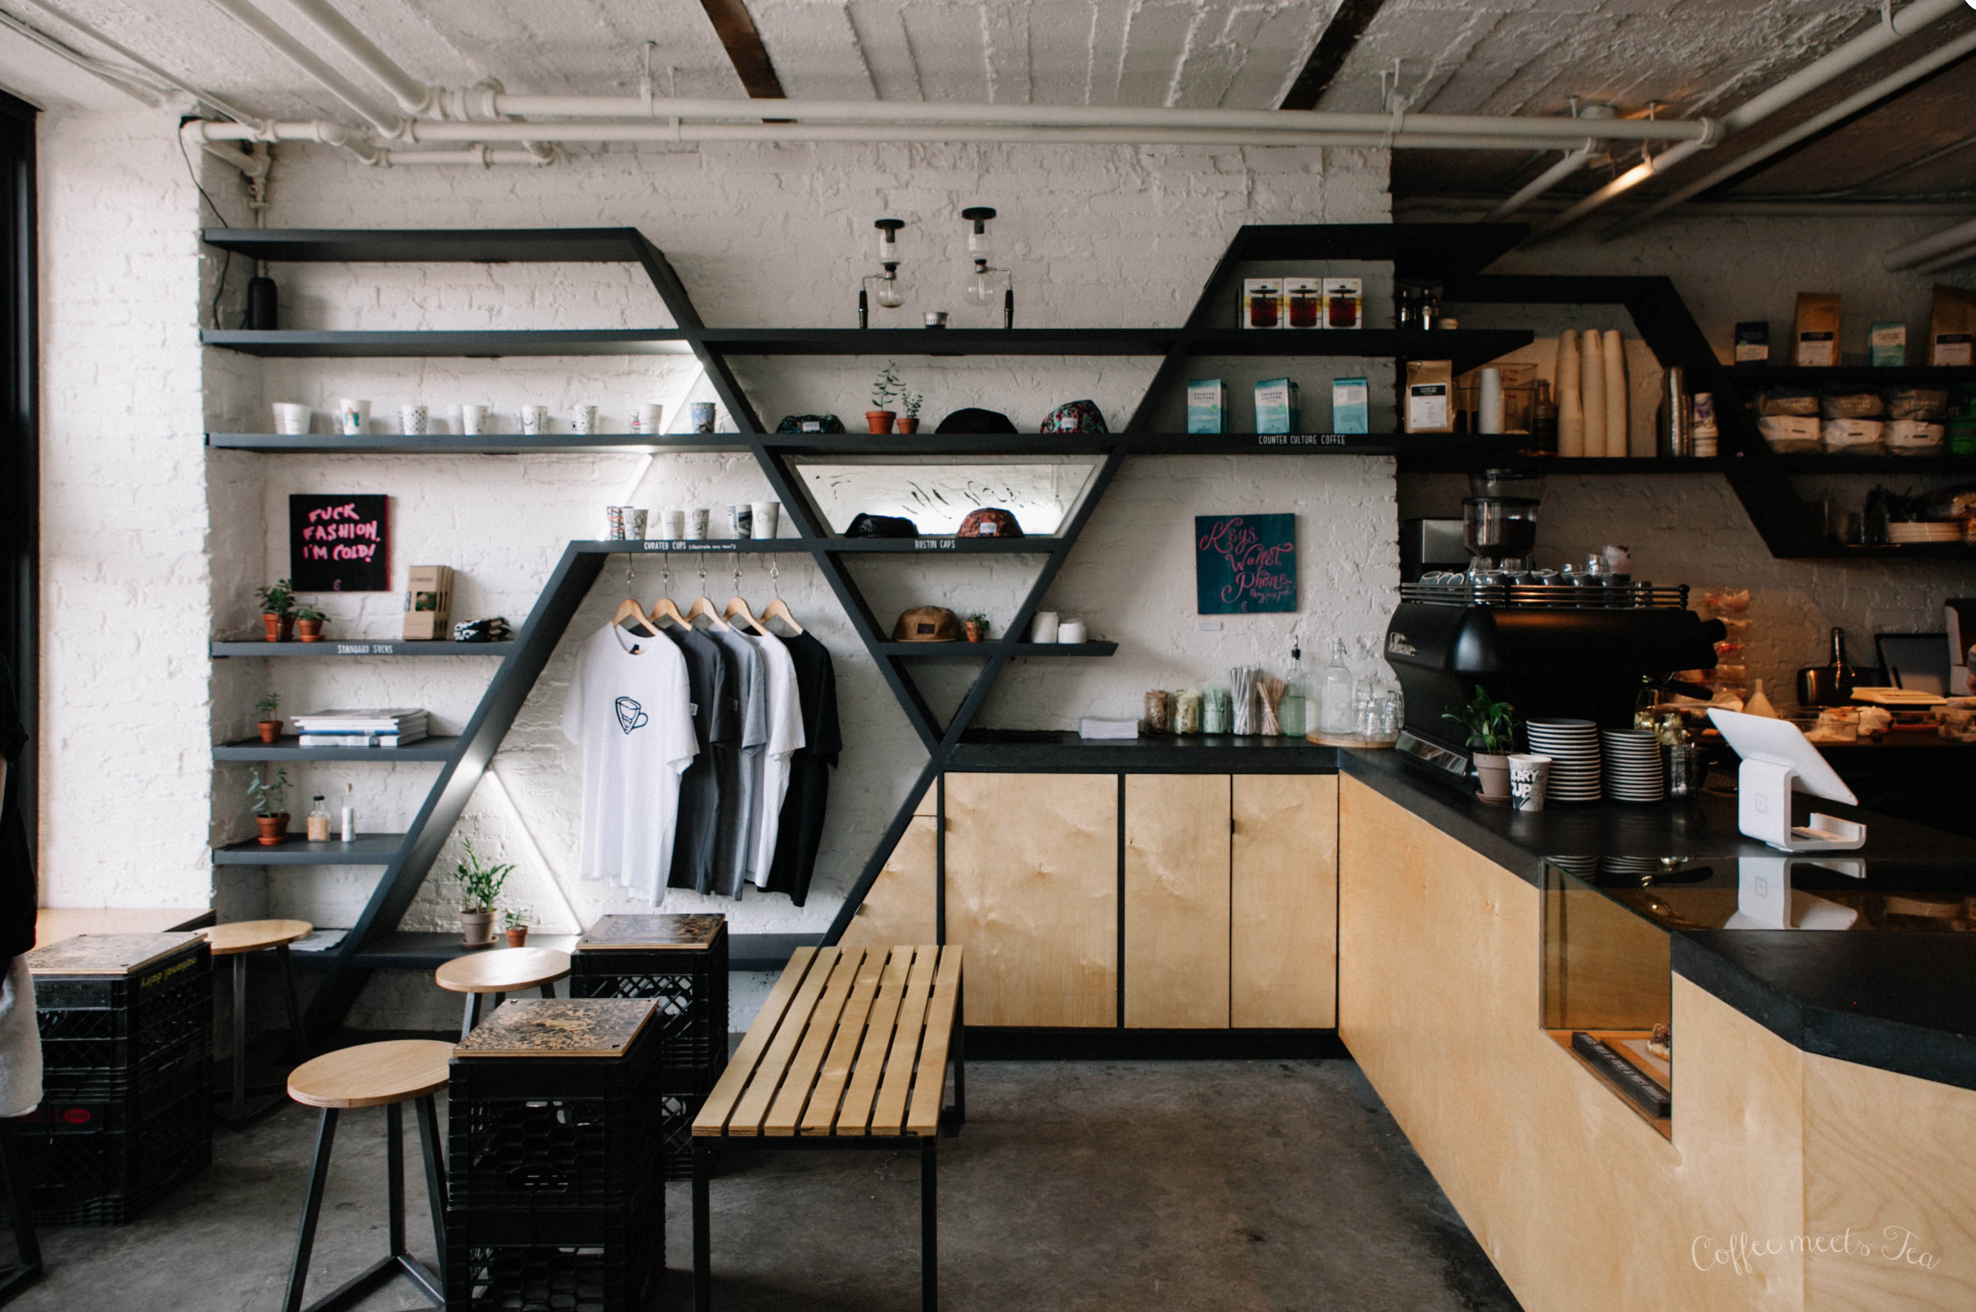 Sweatshop-VIA-COFFEEMEETSTEA-1.png